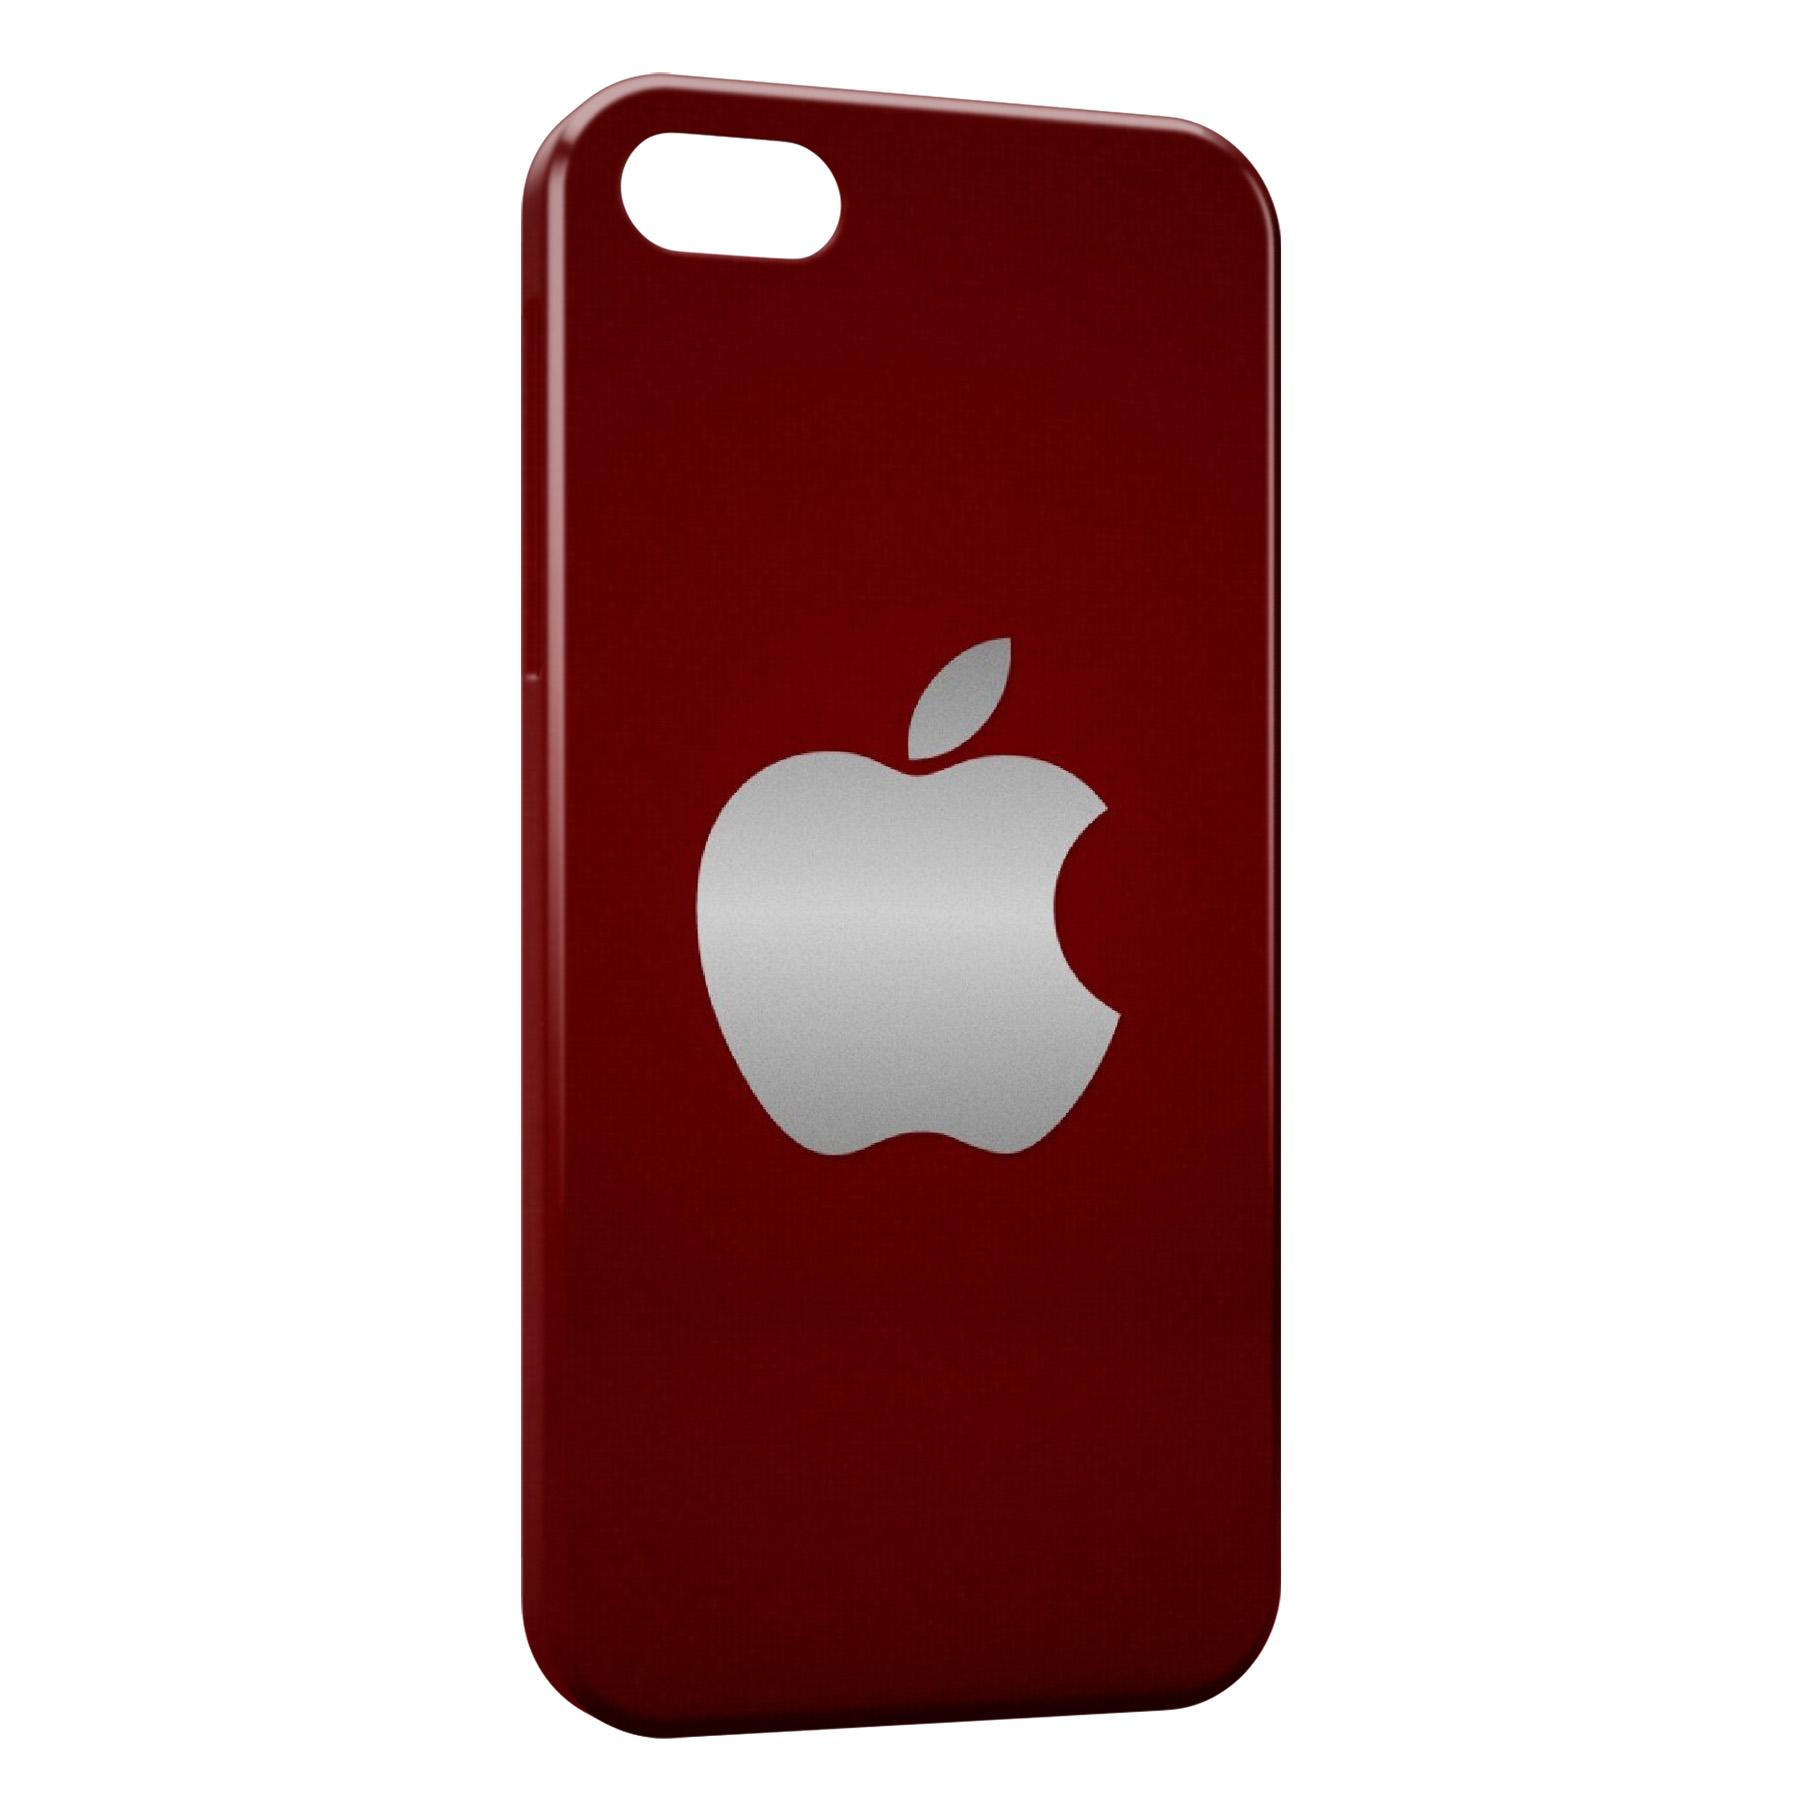 Coque iPhone 4 & 4S Apple Logo 4